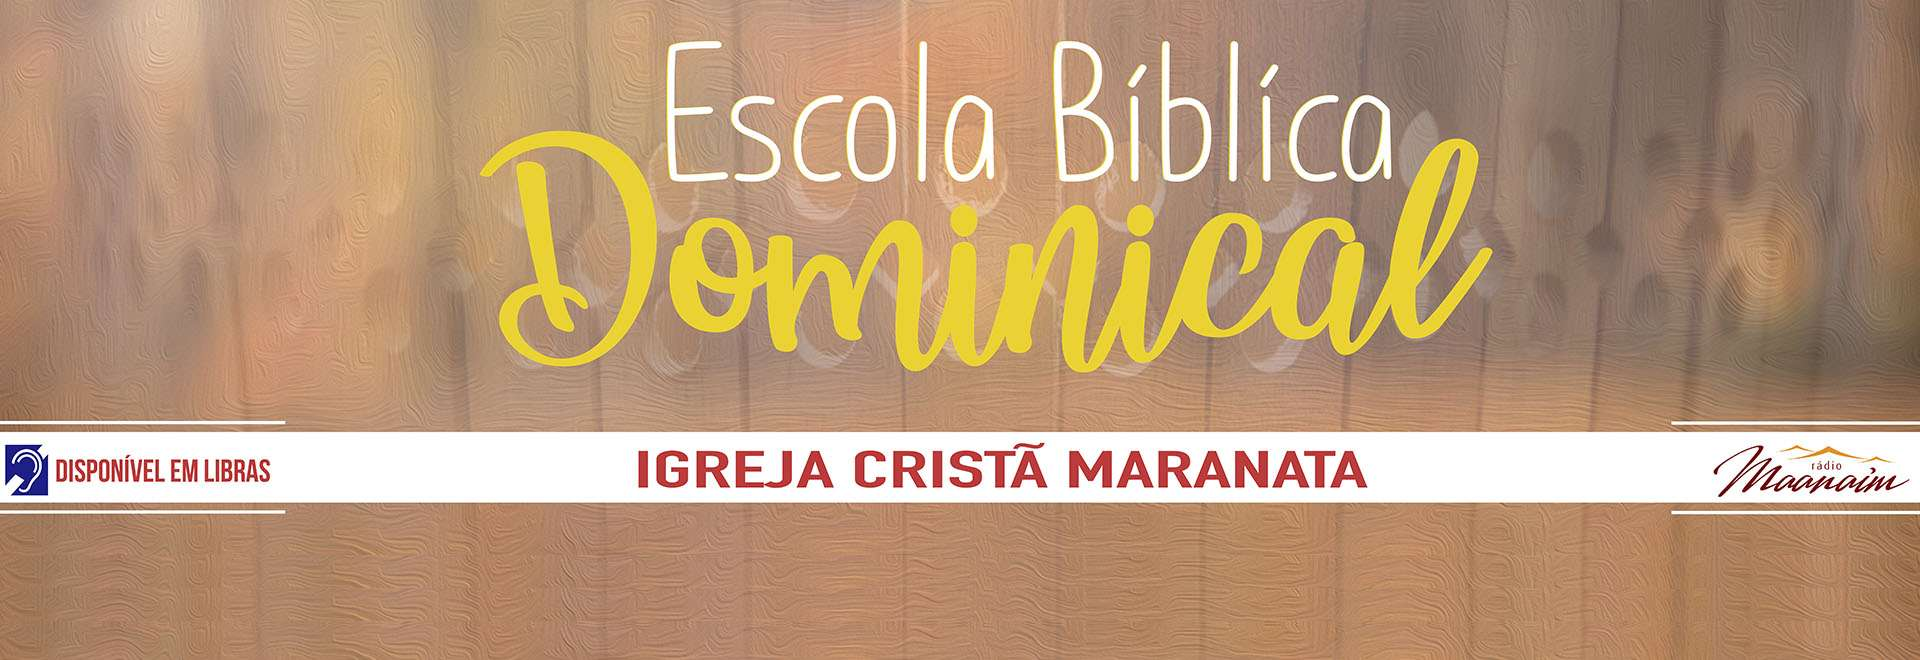 Participações da EBD da Igreja Cristã Maranata - 13/09/2020